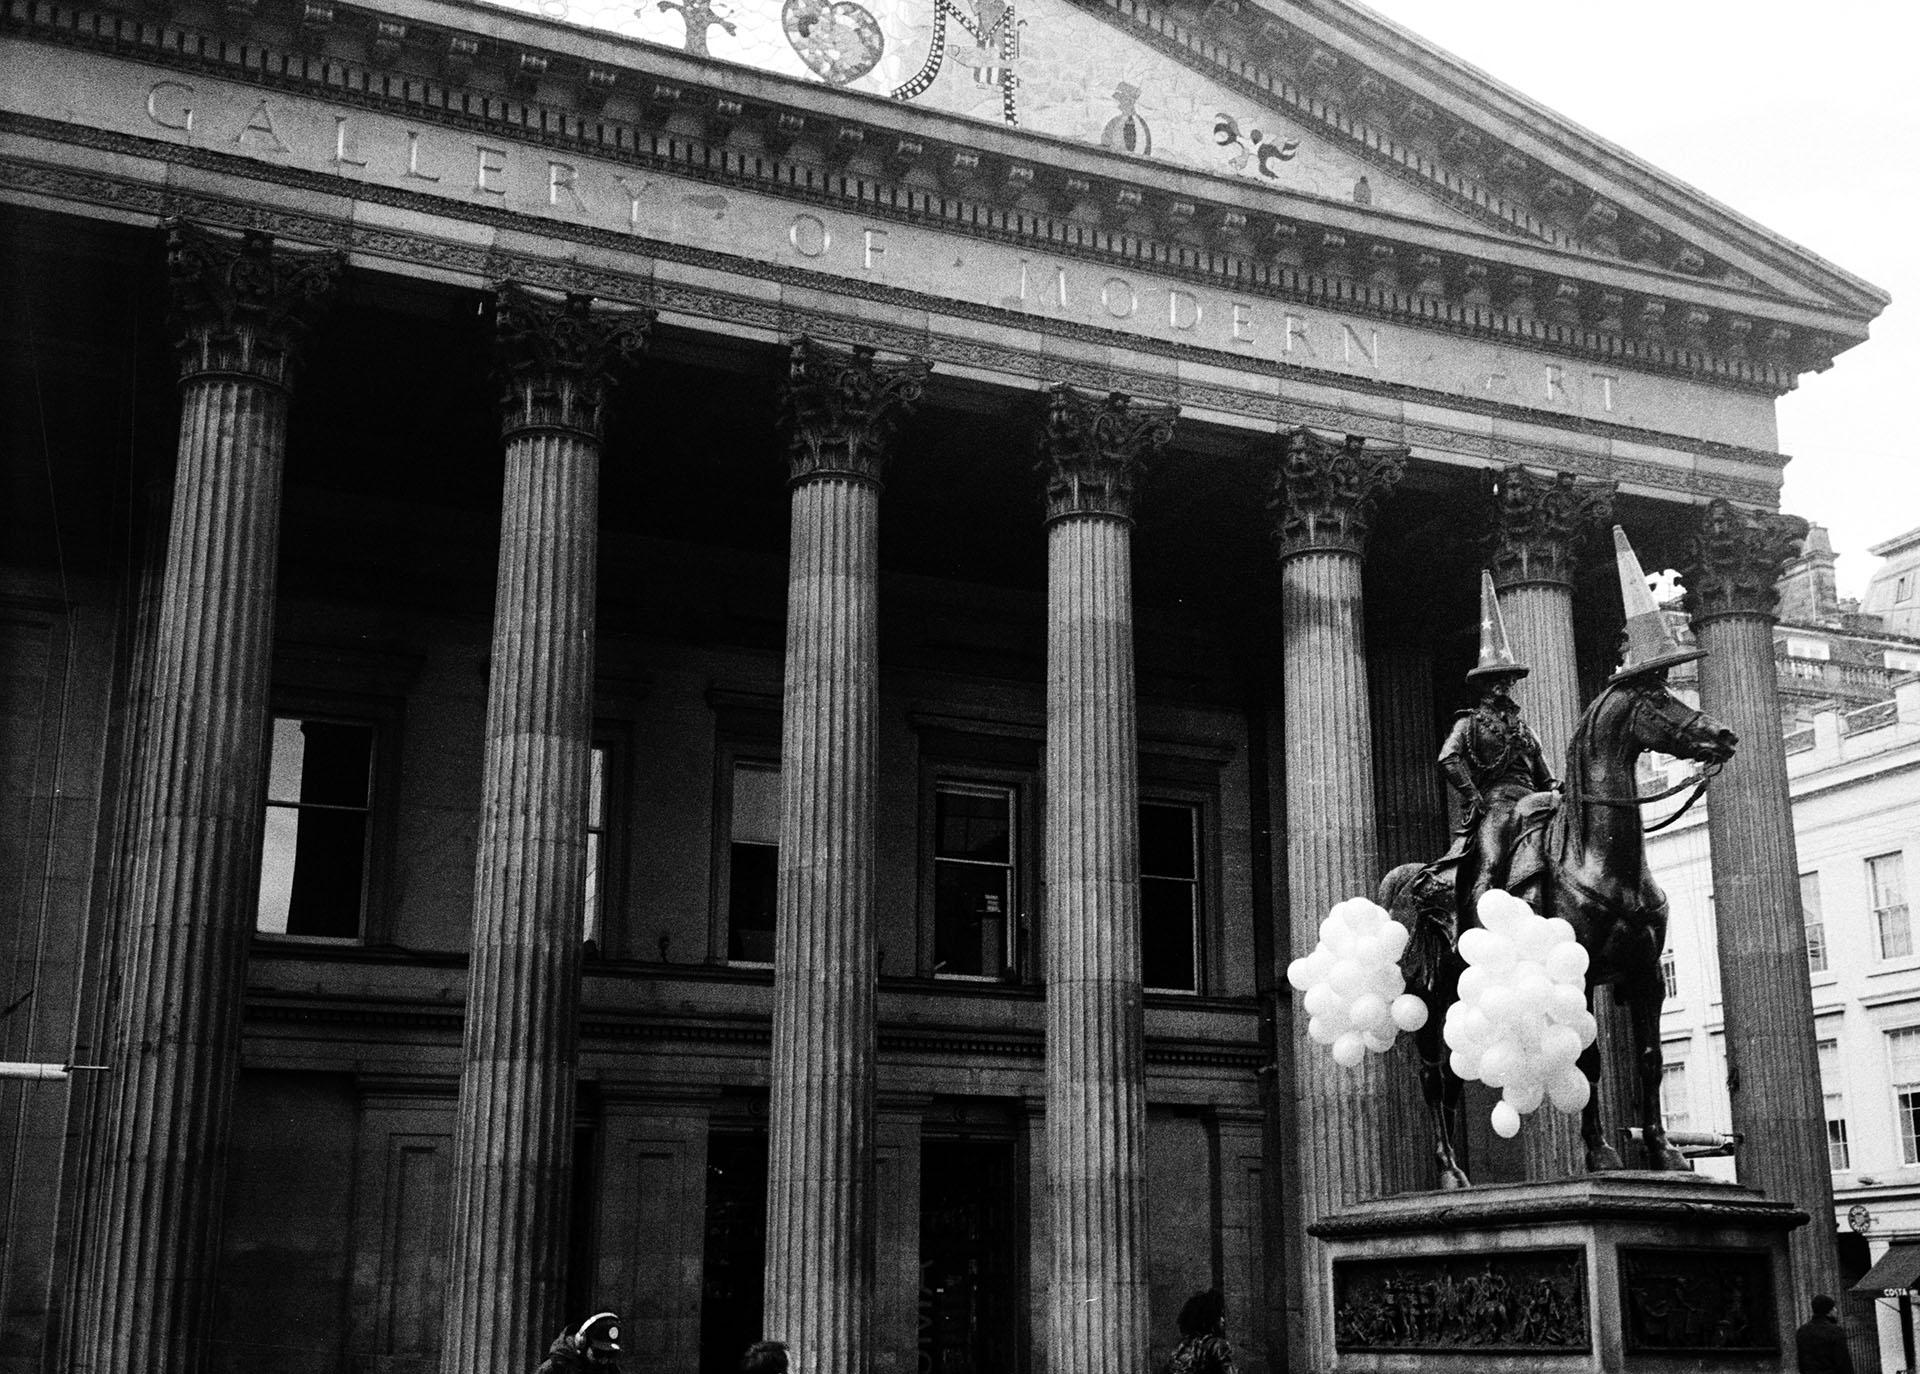 Glasgow cone